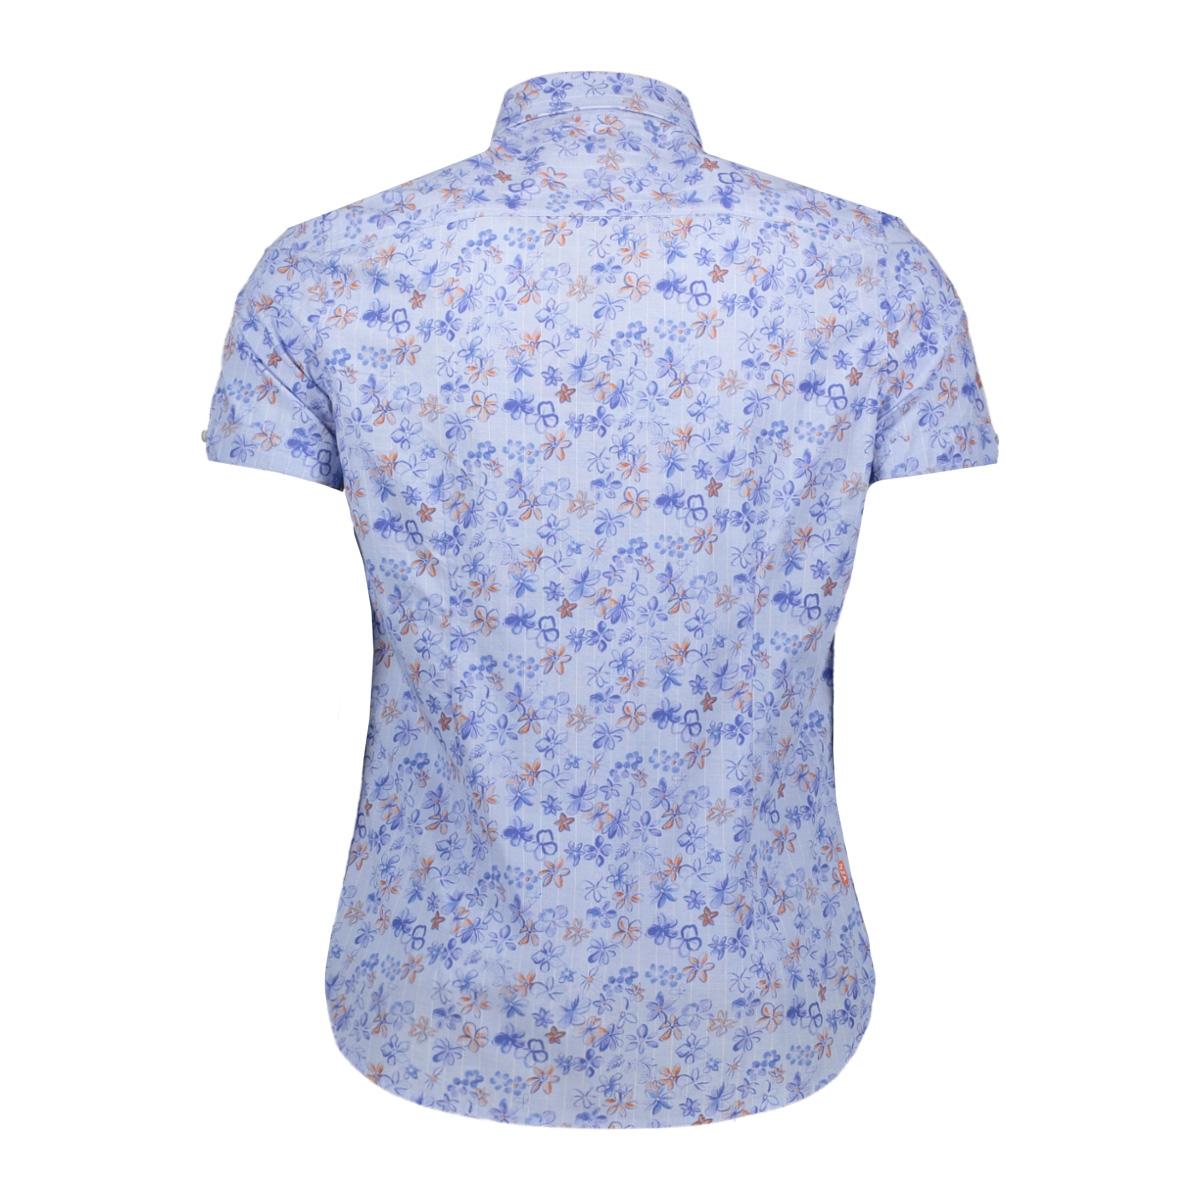 waimeha 19dn503d nza overhemd 258 maori blue